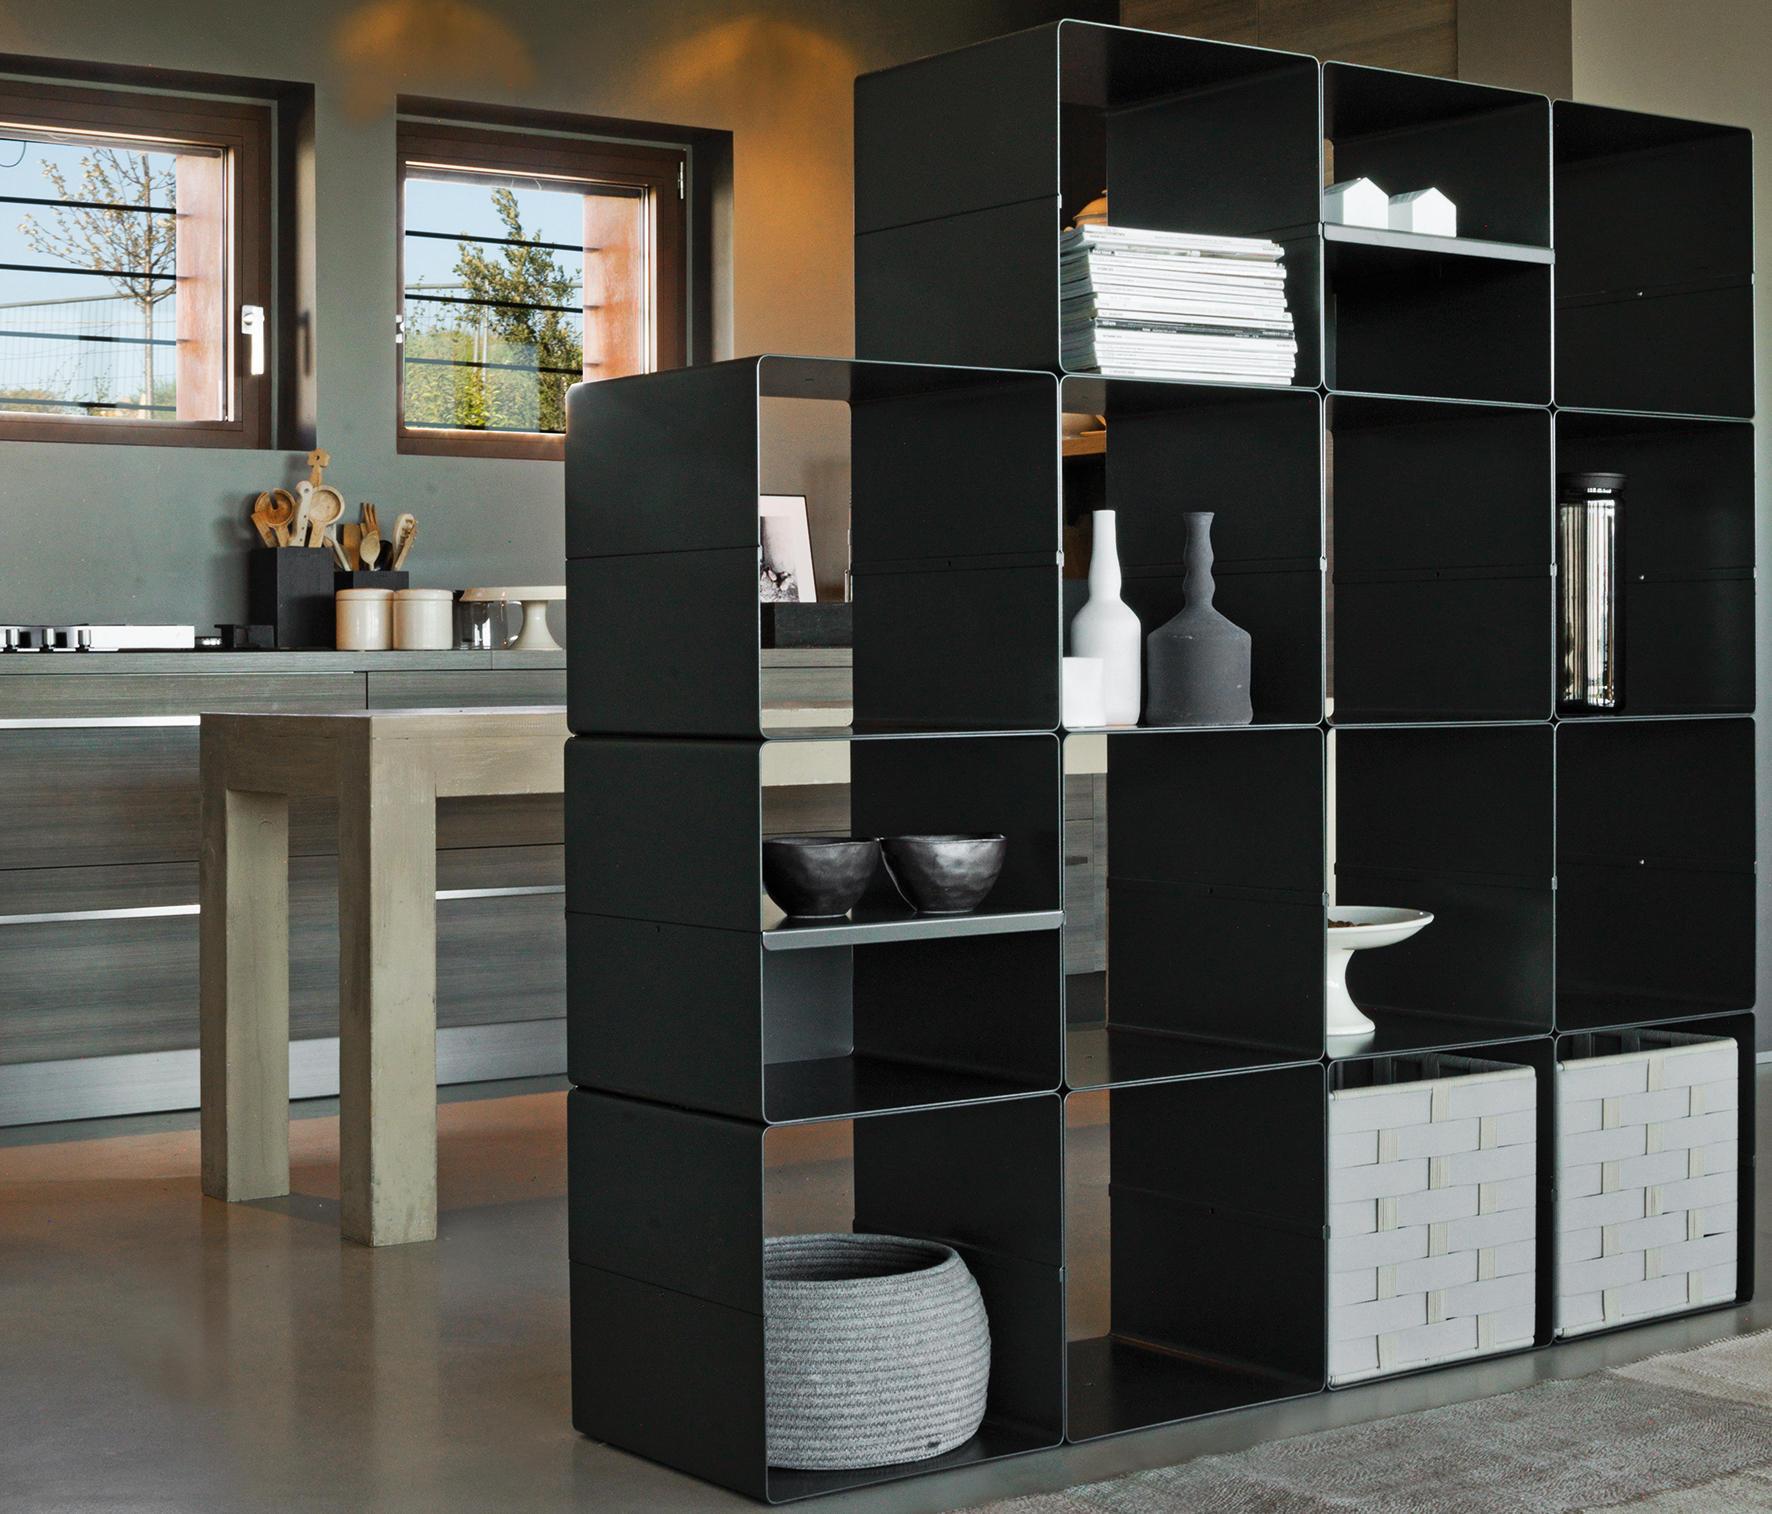 kolta regalmodule von verzelloni architonic. Black Bedroom Furniture Sets. Home Design Ideas